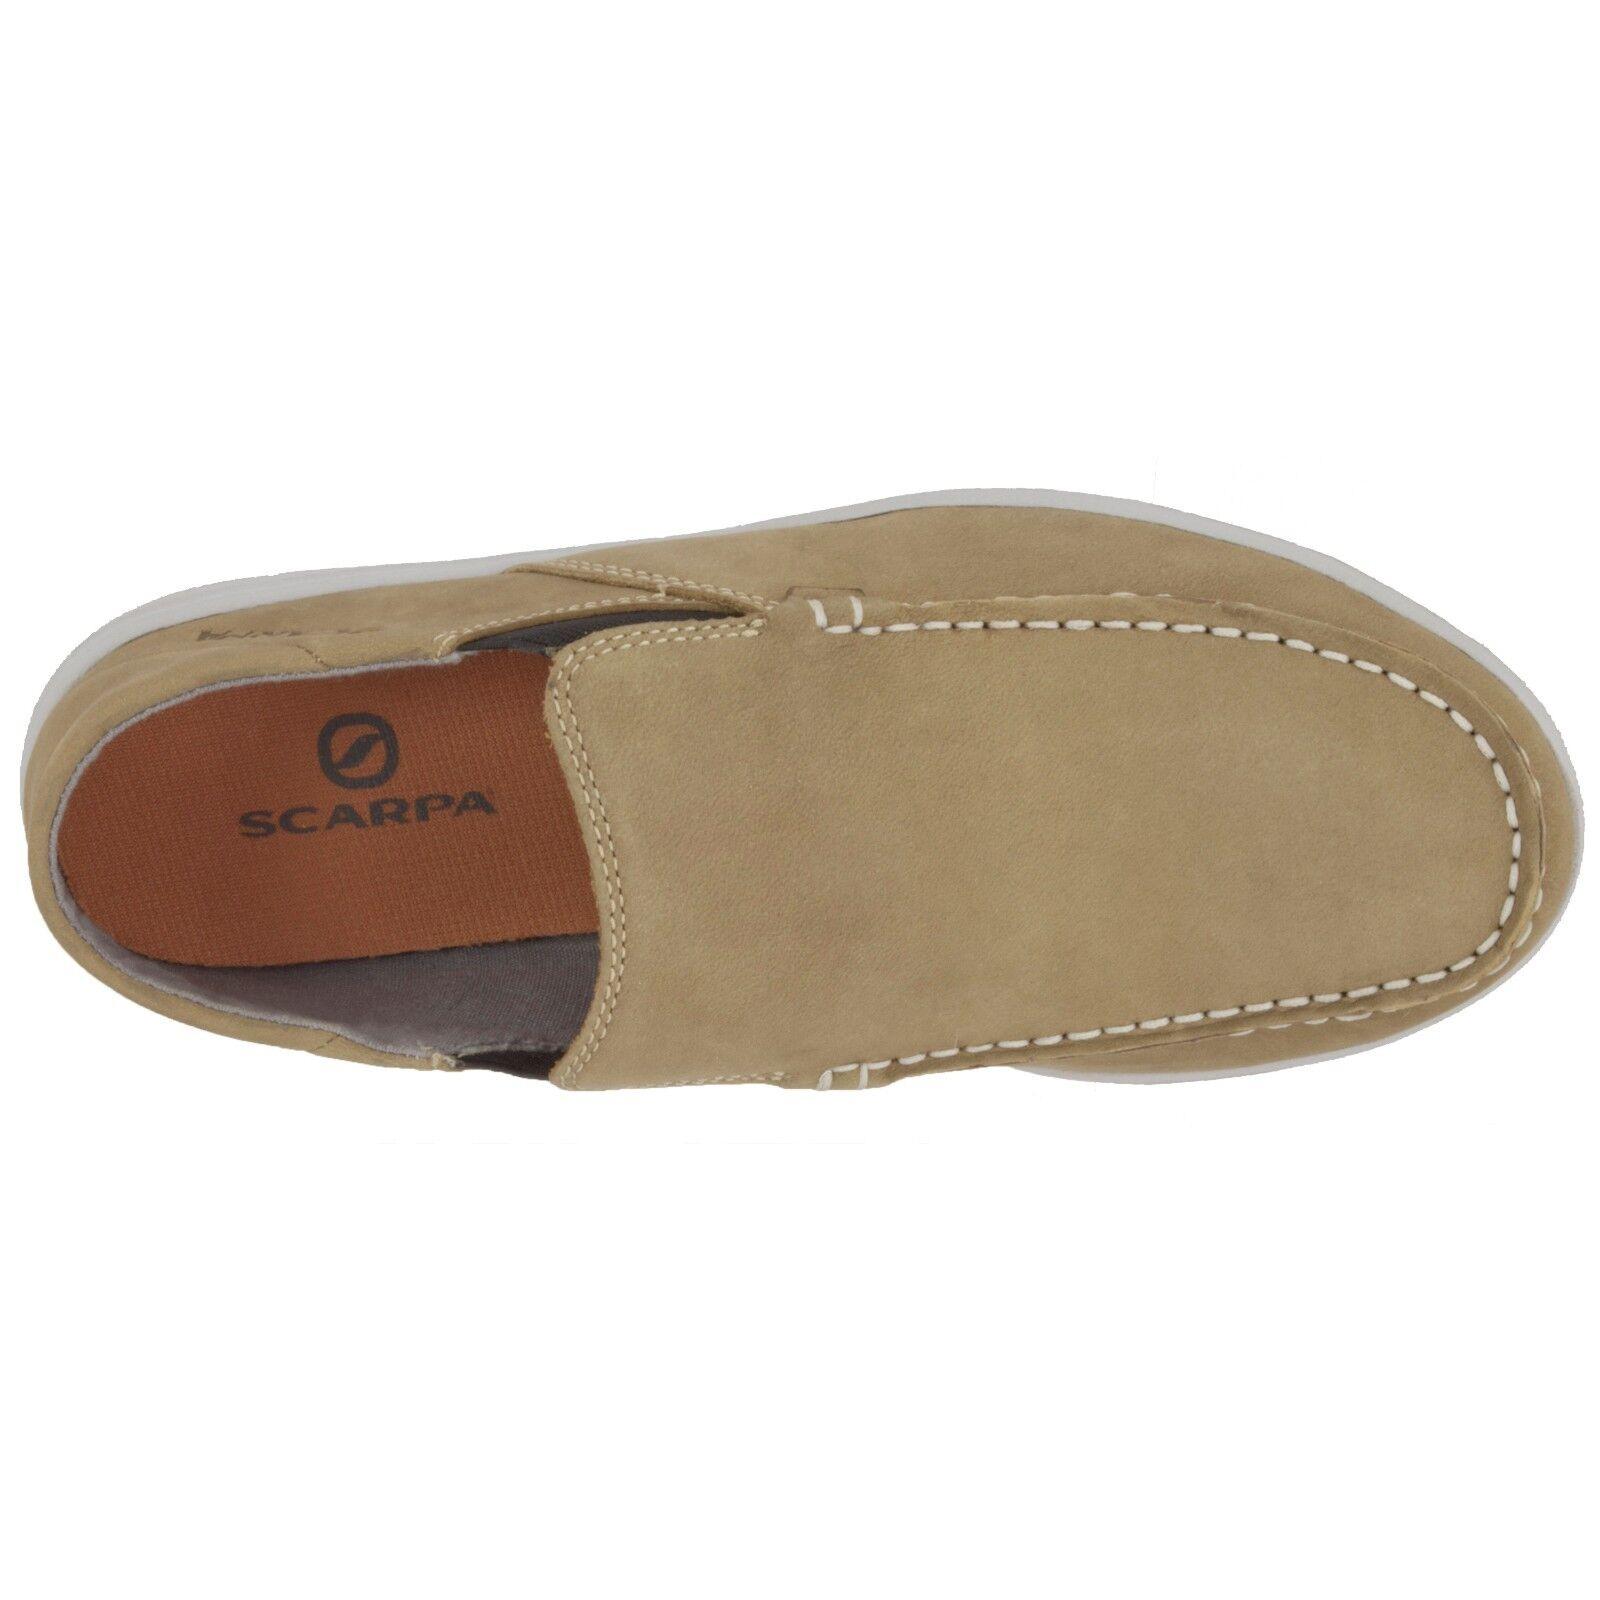 SCARPA WOMEN'S MEN'S SIDECAR SYNTHETIC SUEDE USM UPPER Schuhe USW 7, USM SUEDE 6 EU 38 de7133